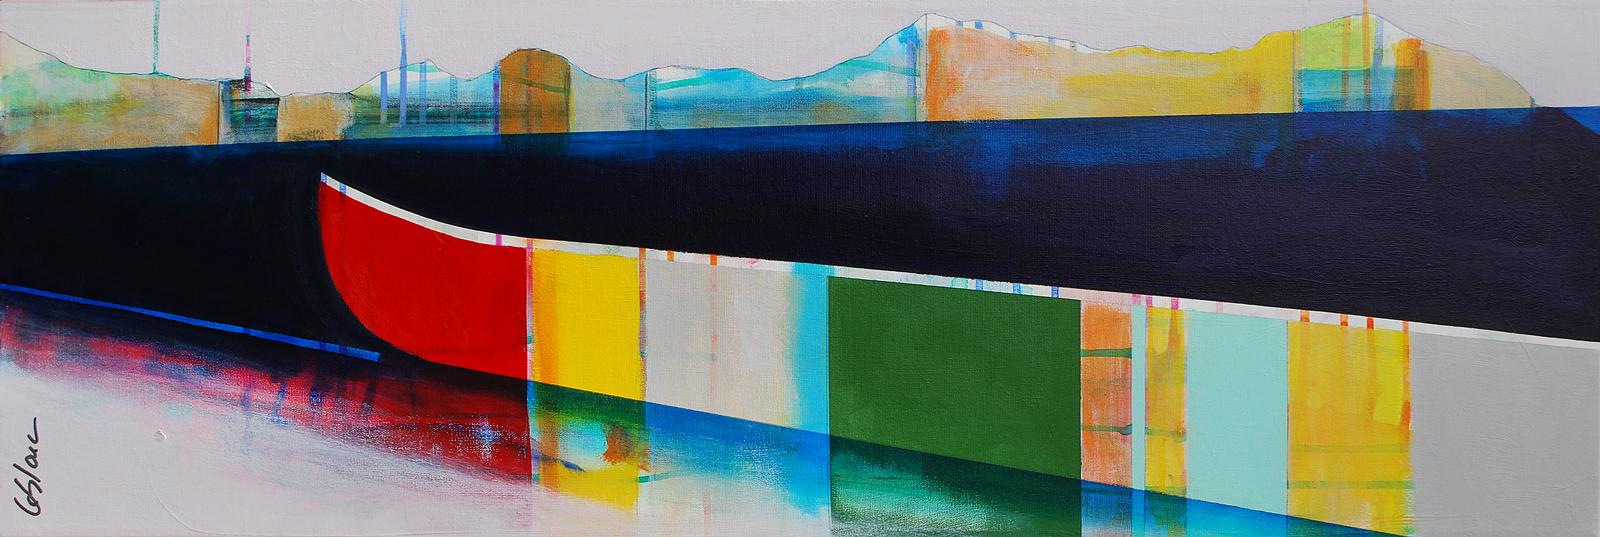 Escapade, mixed media canoe painting by Sylvain Leblanc | Effusion Art Gallery + Cast Glass Studio, Invermere BC